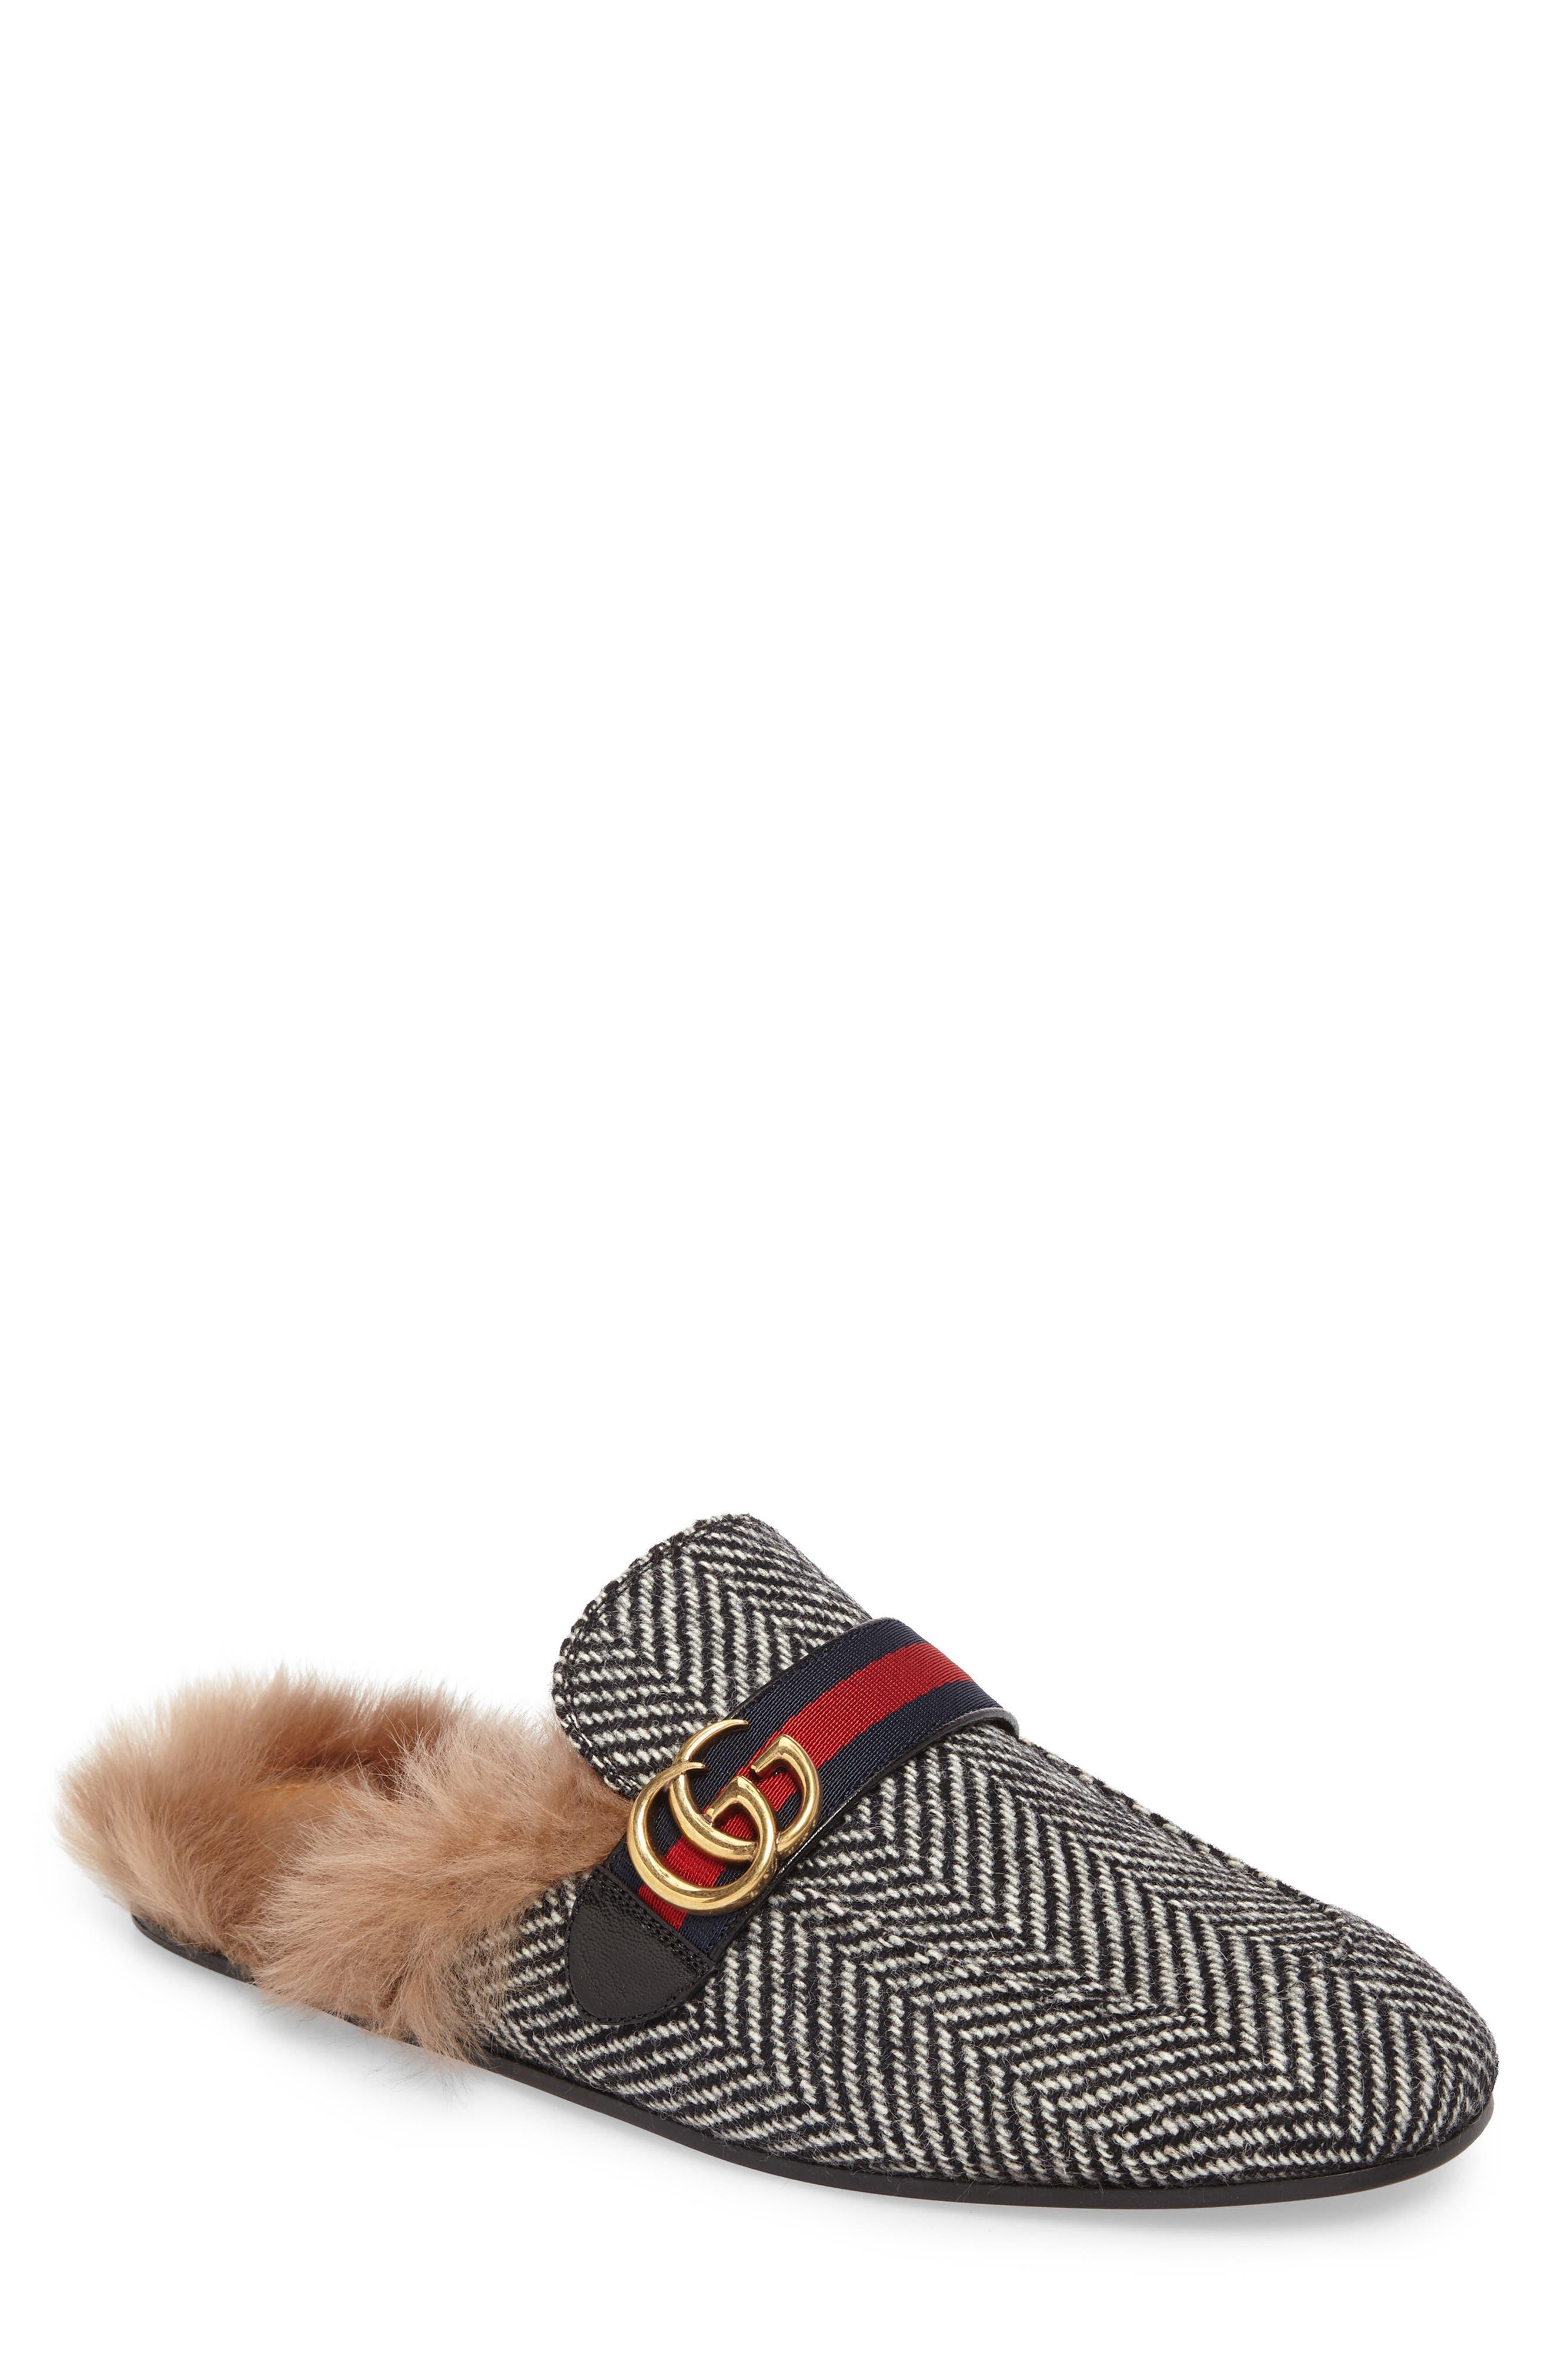 Alternate Image 1 Selected - Gucci New Princetown Genuine Shearling Herringbone Loafer Mule (Men)